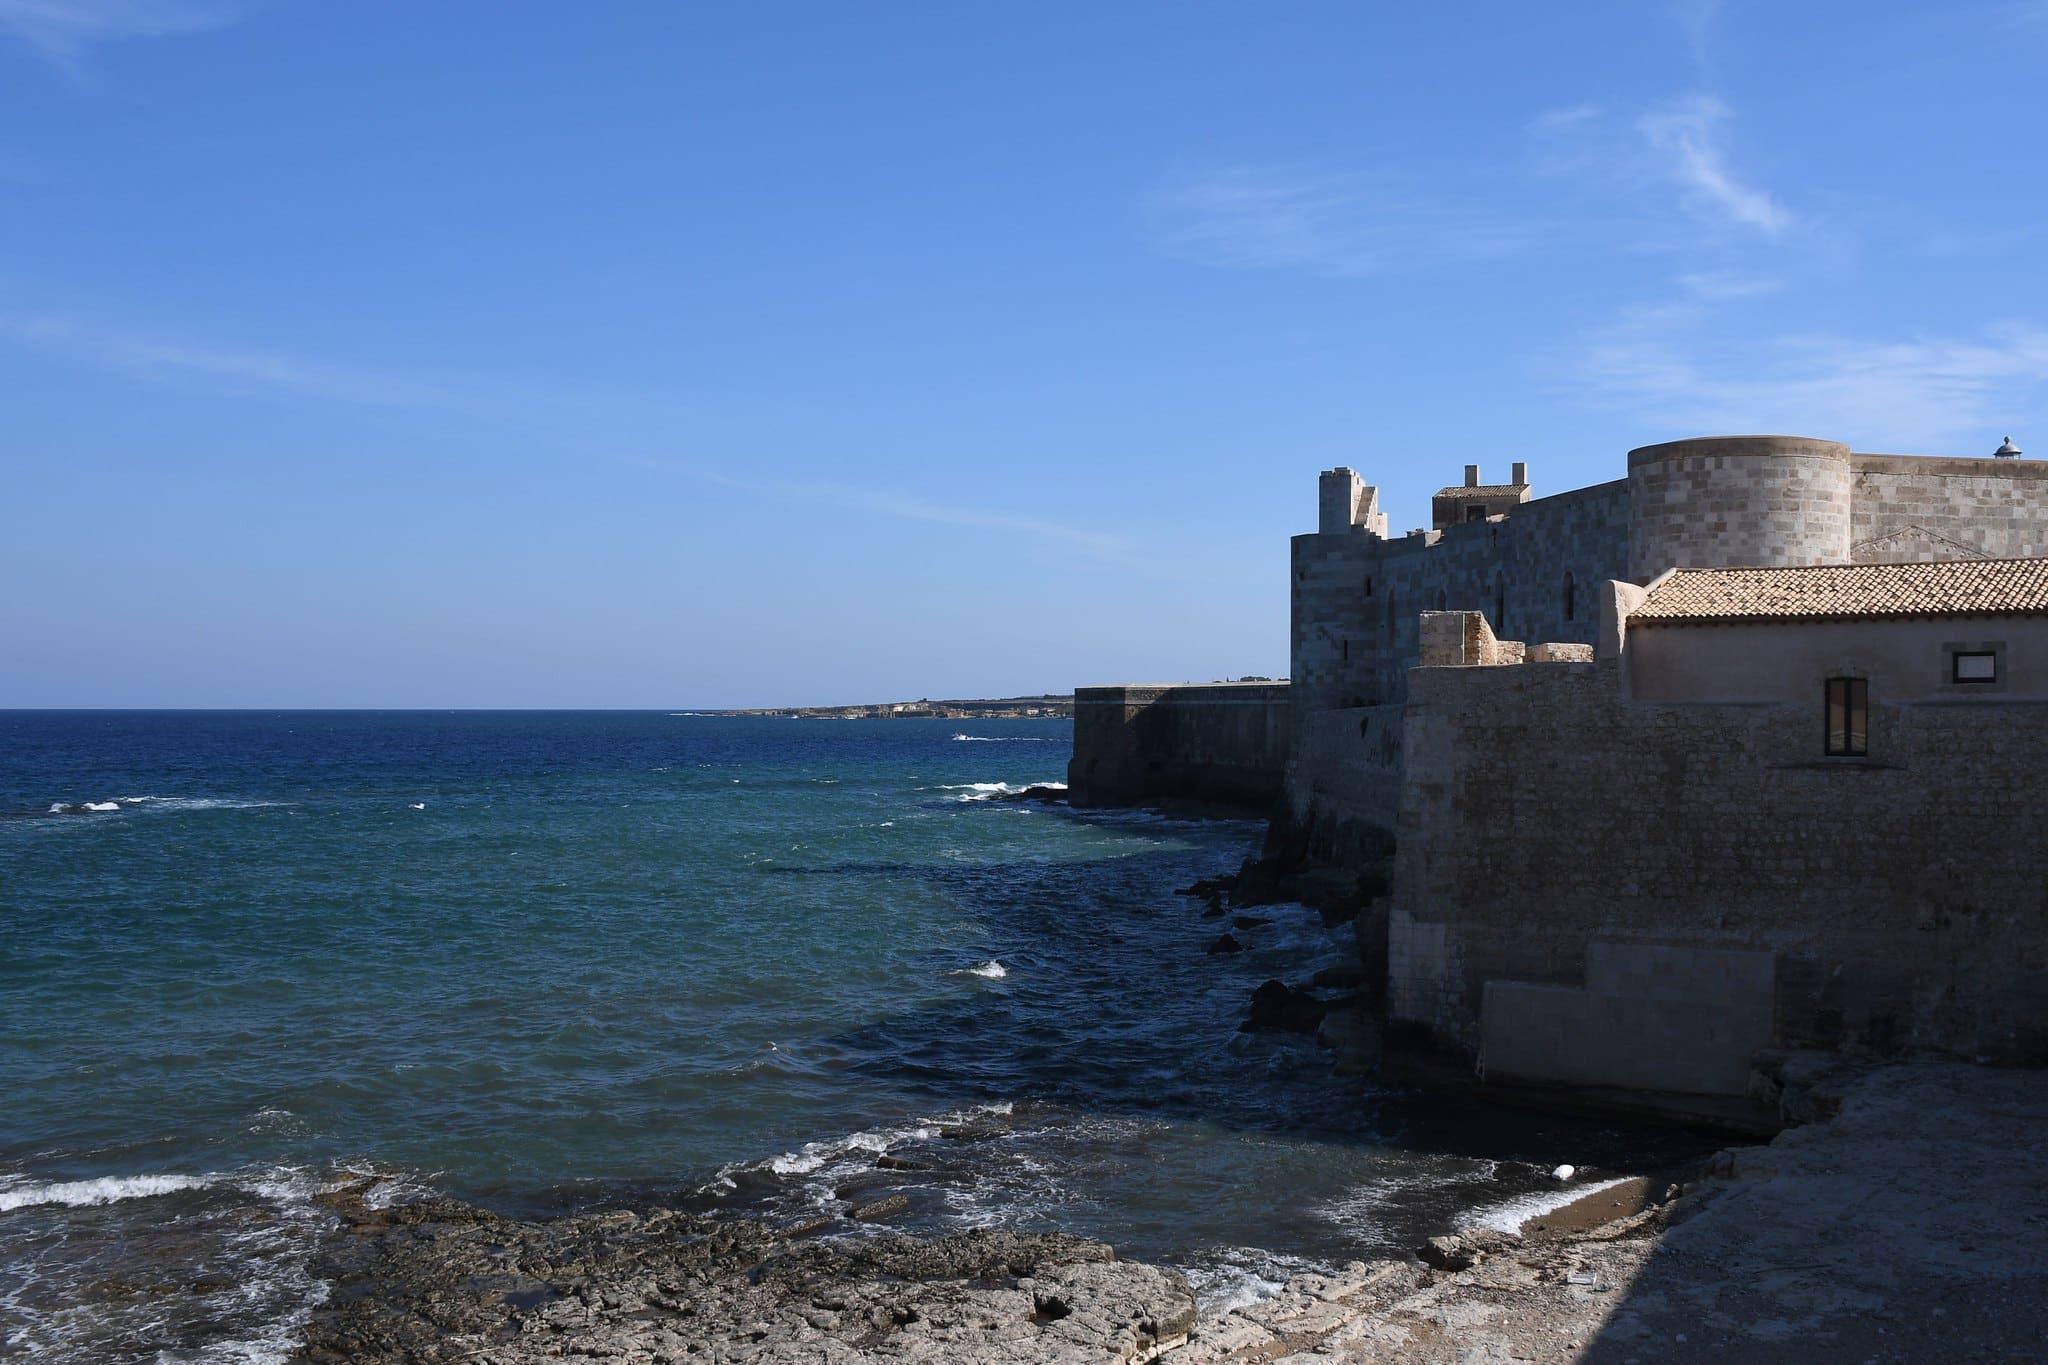 castello di siracusa